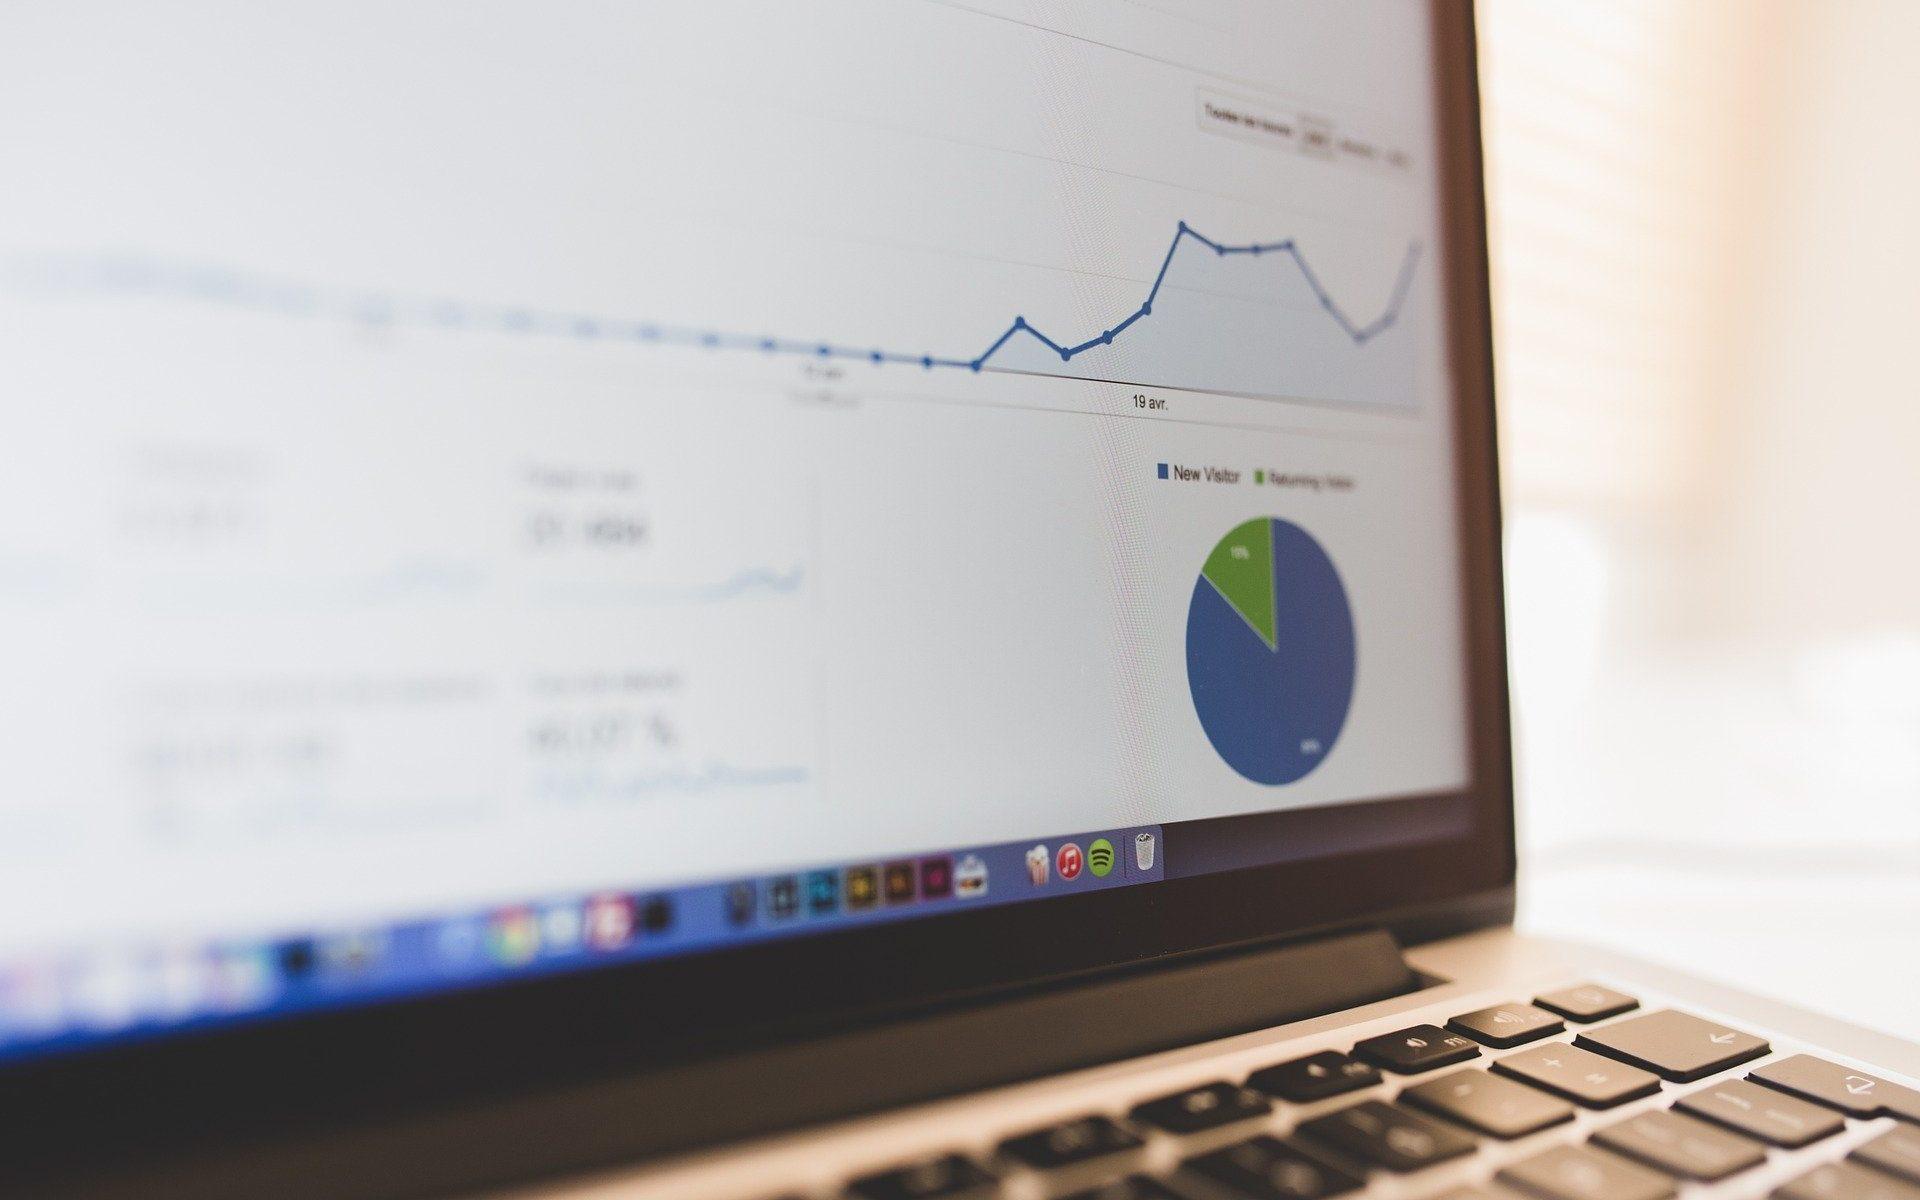 Computerkenntnisse im Beruf: Microsoft Access, inklusive Microsoft-Zertifizierung